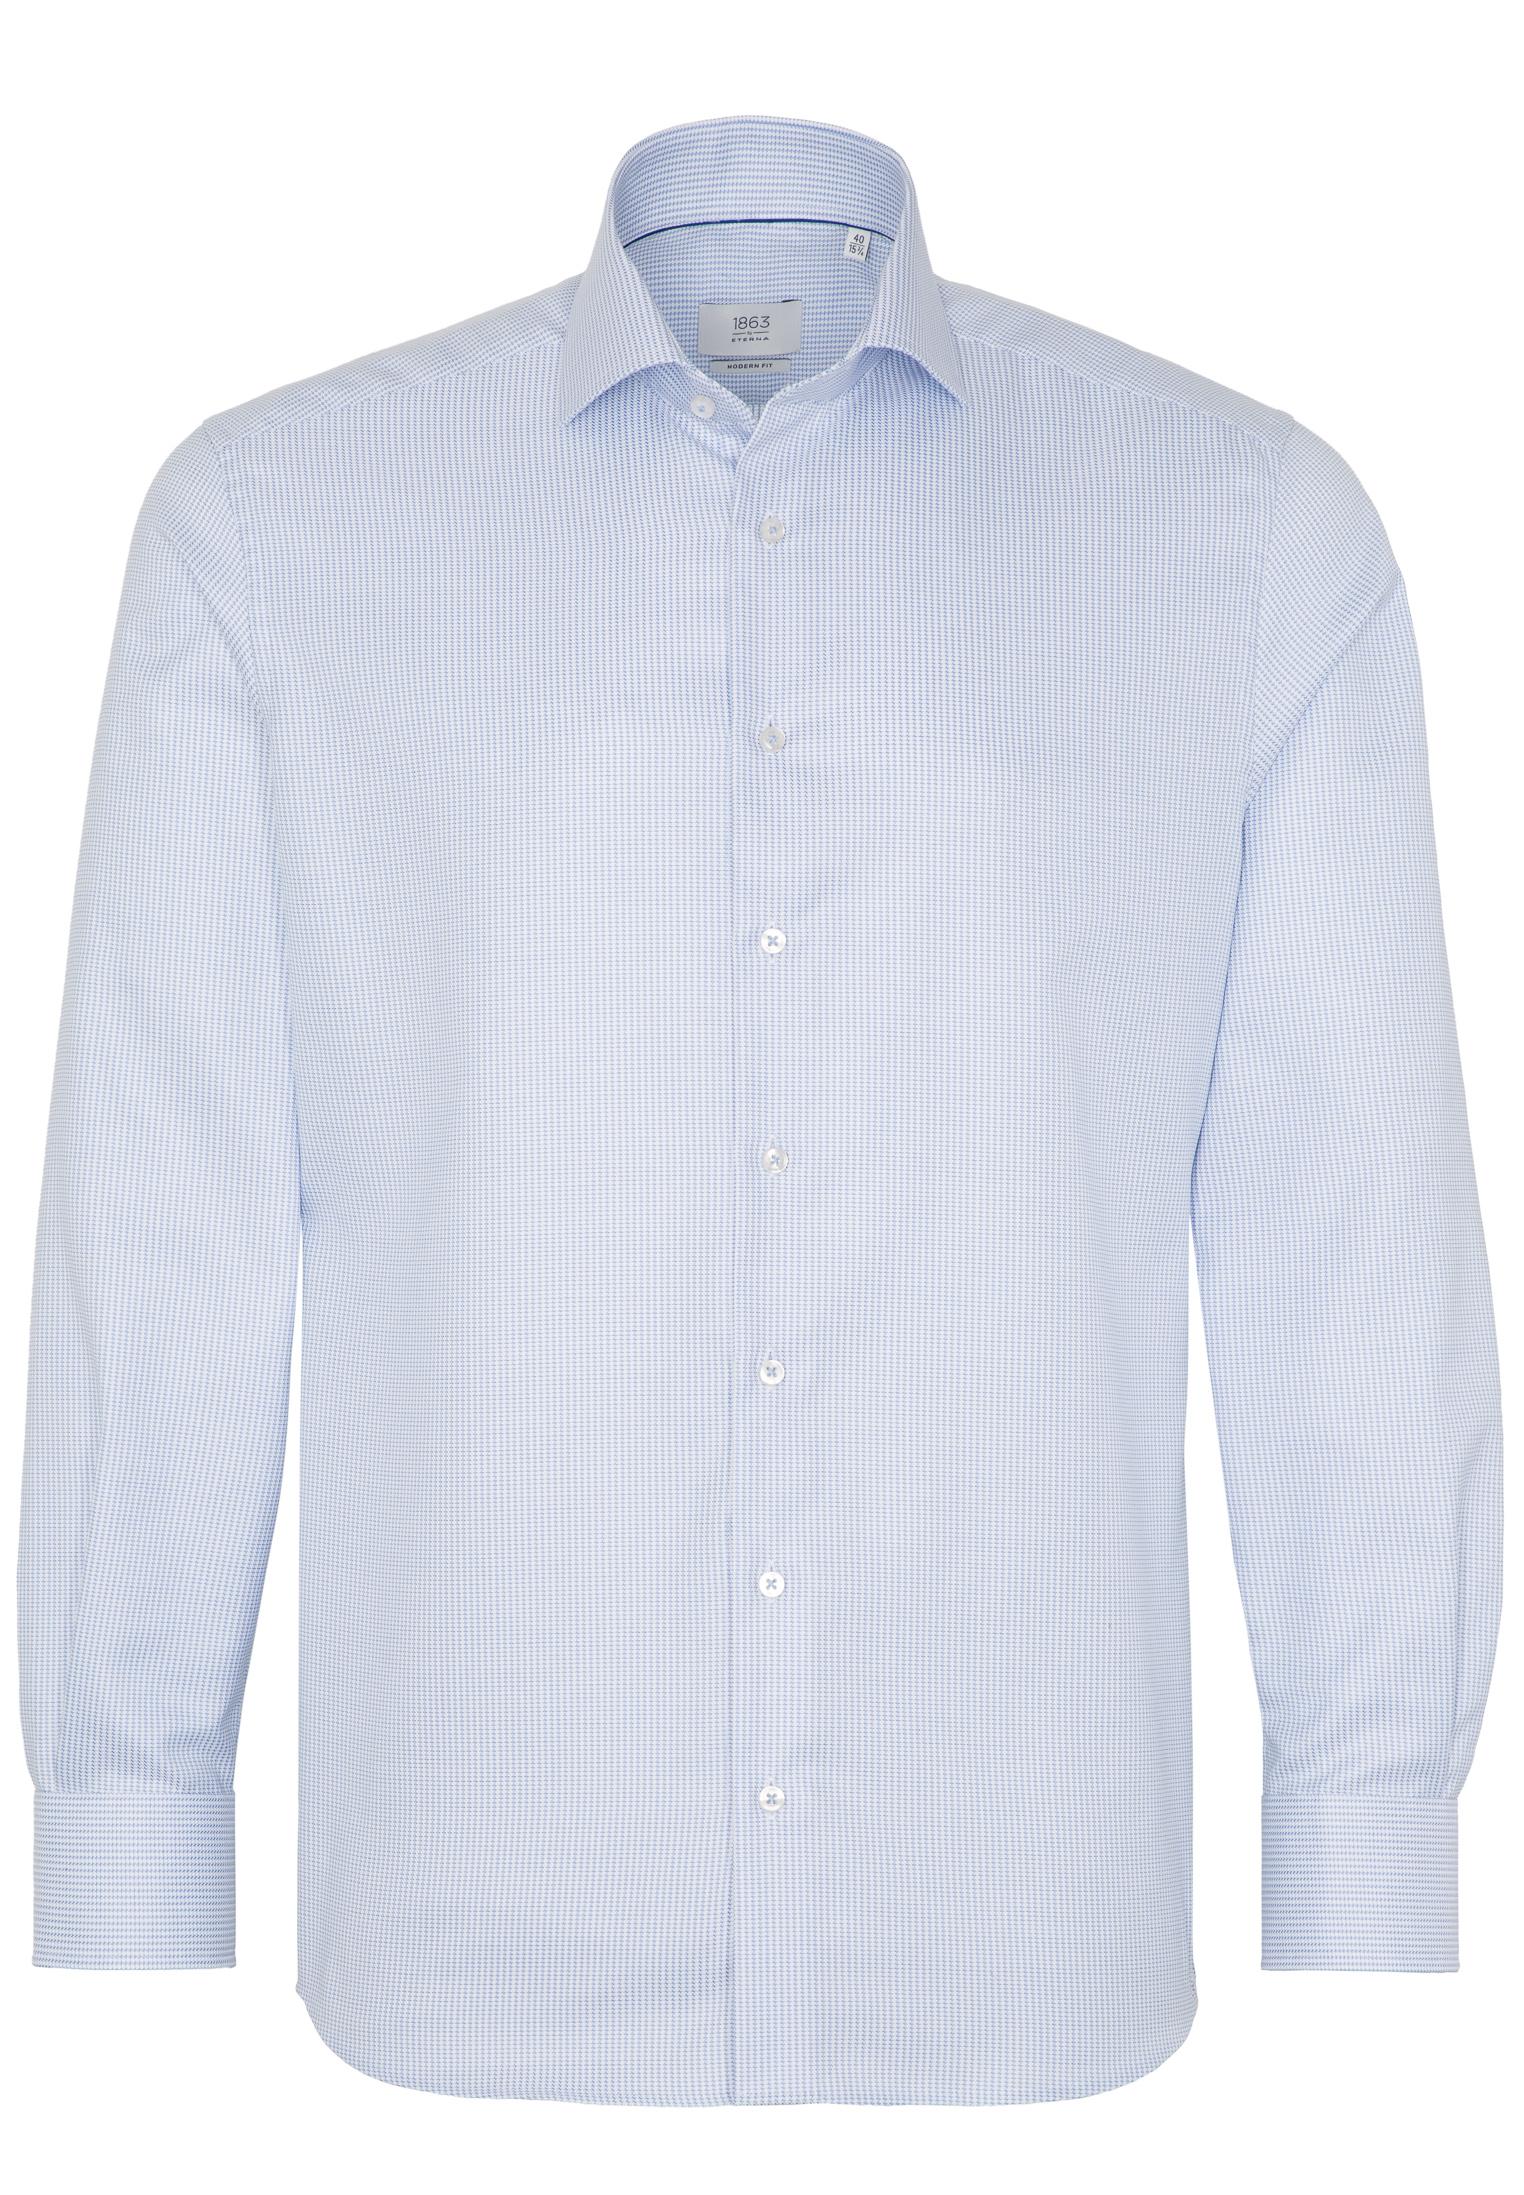 ETERNA Langarm Hemd blau mit Struktur Modern Fit